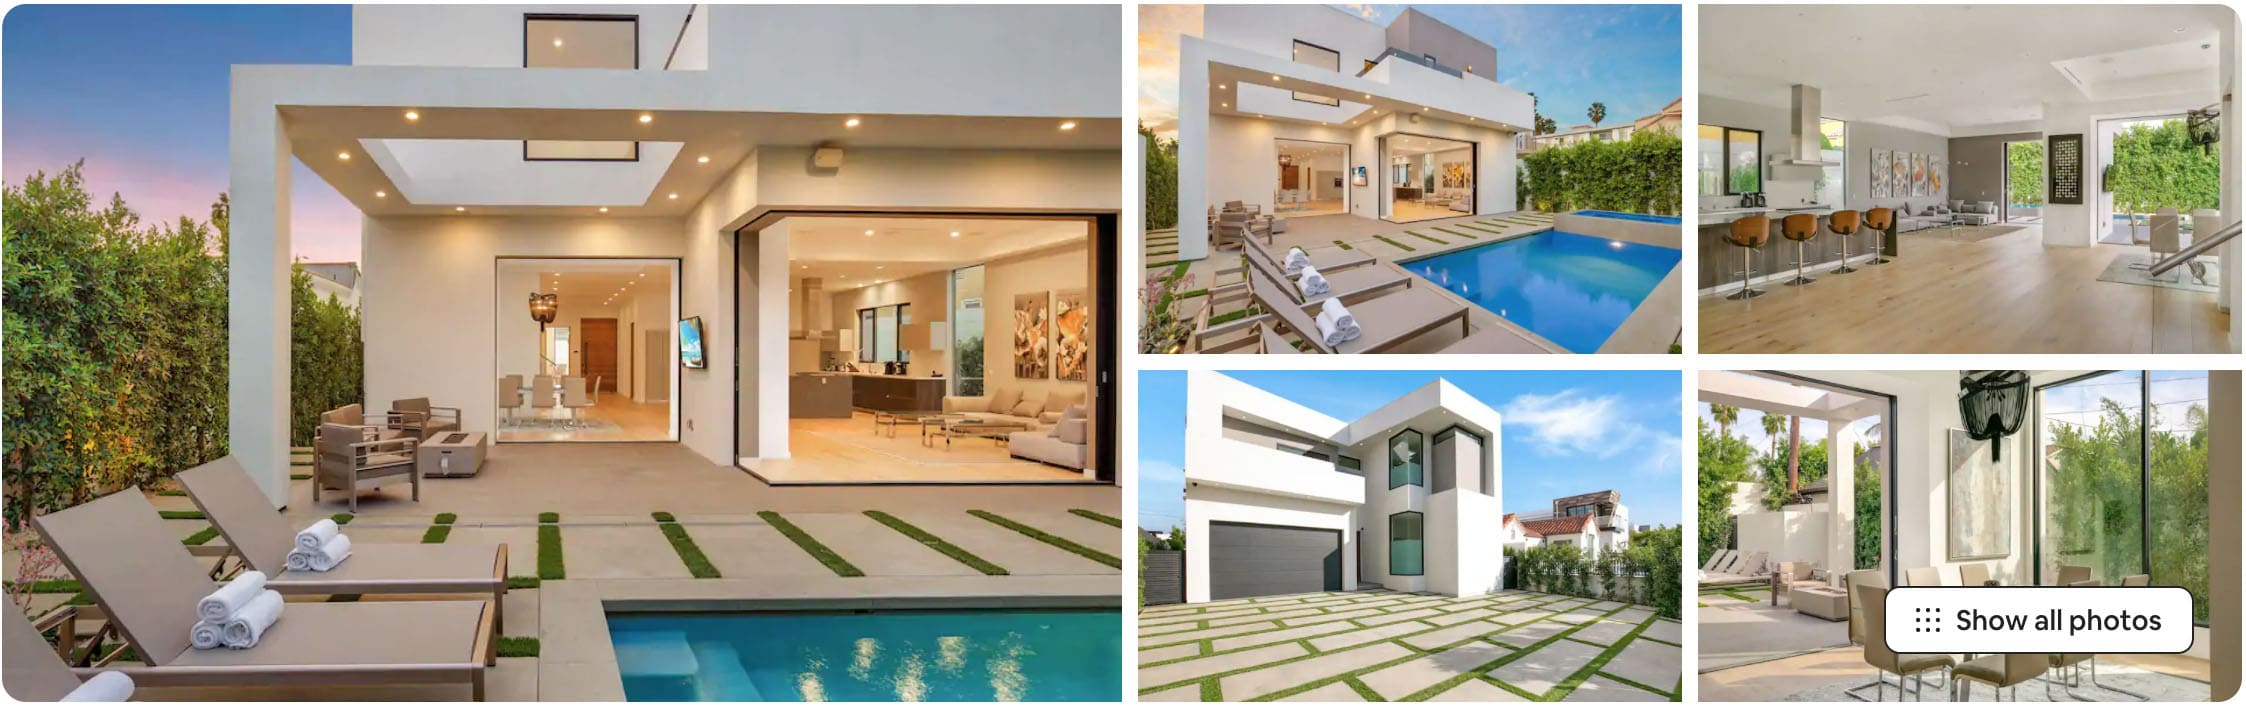 modern melrose mansion